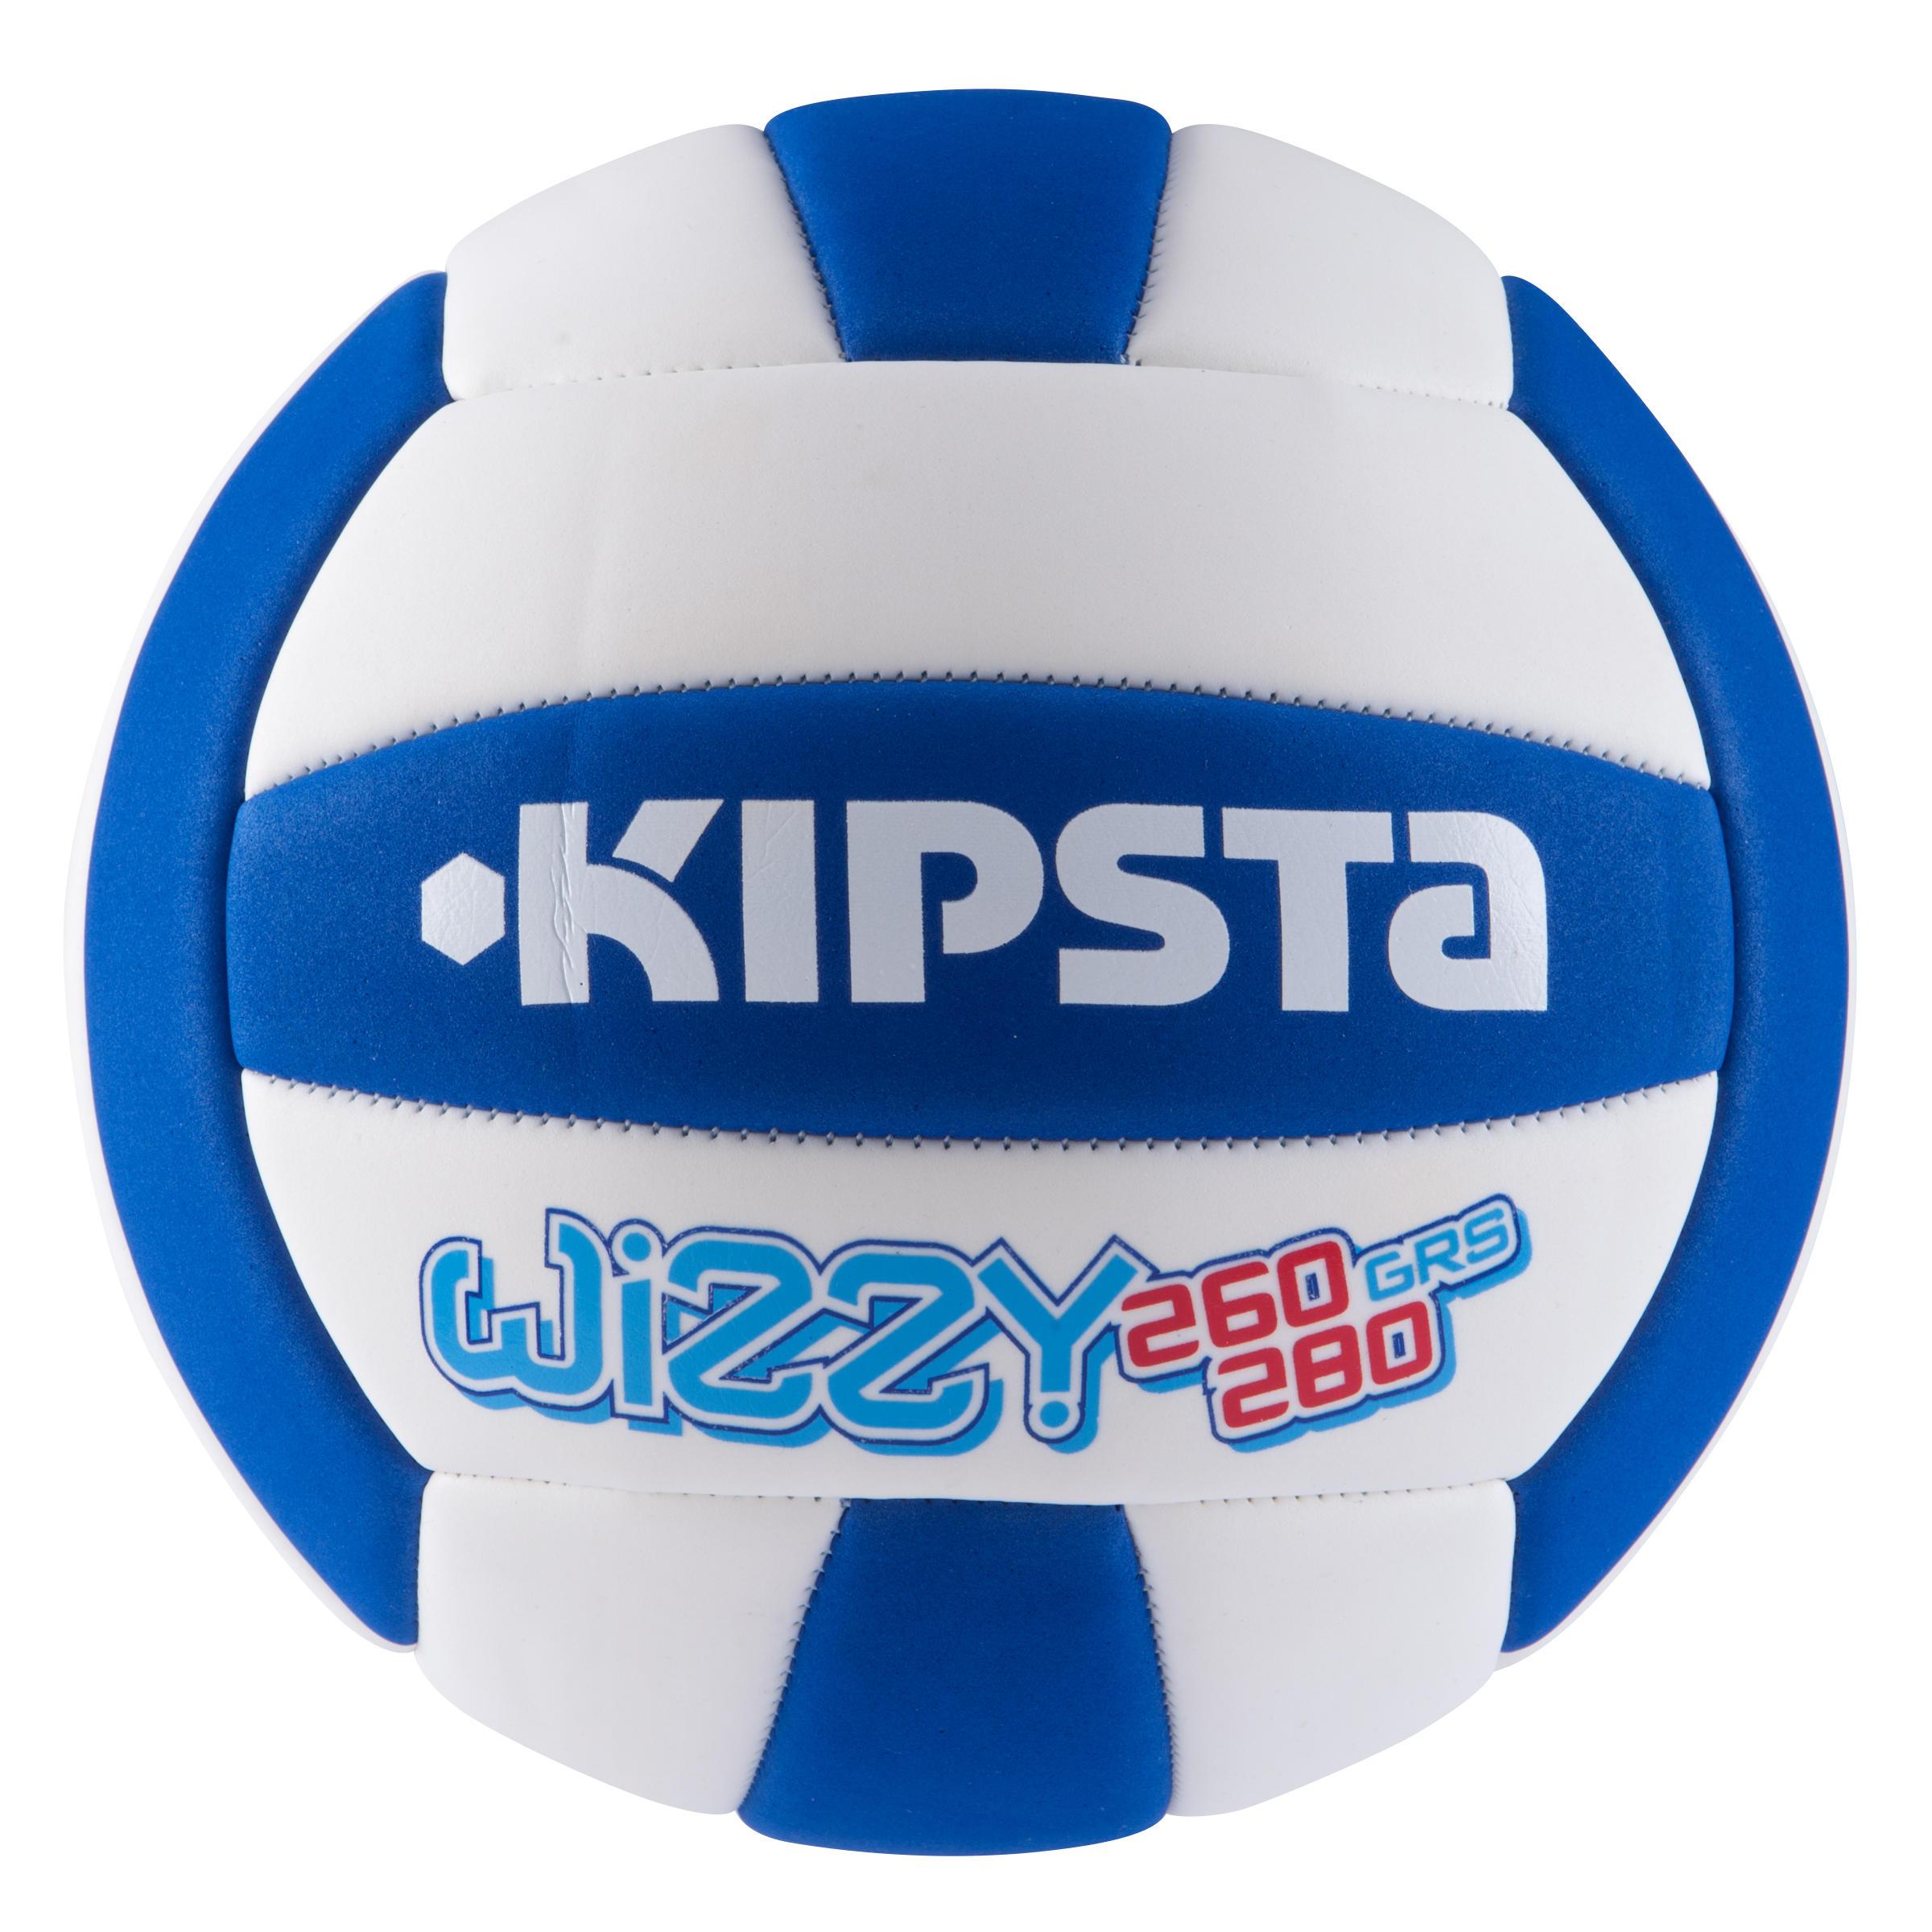 Kipsta Volleybal Wizzy 3 gewichtsklasses 200 tot 280 gram